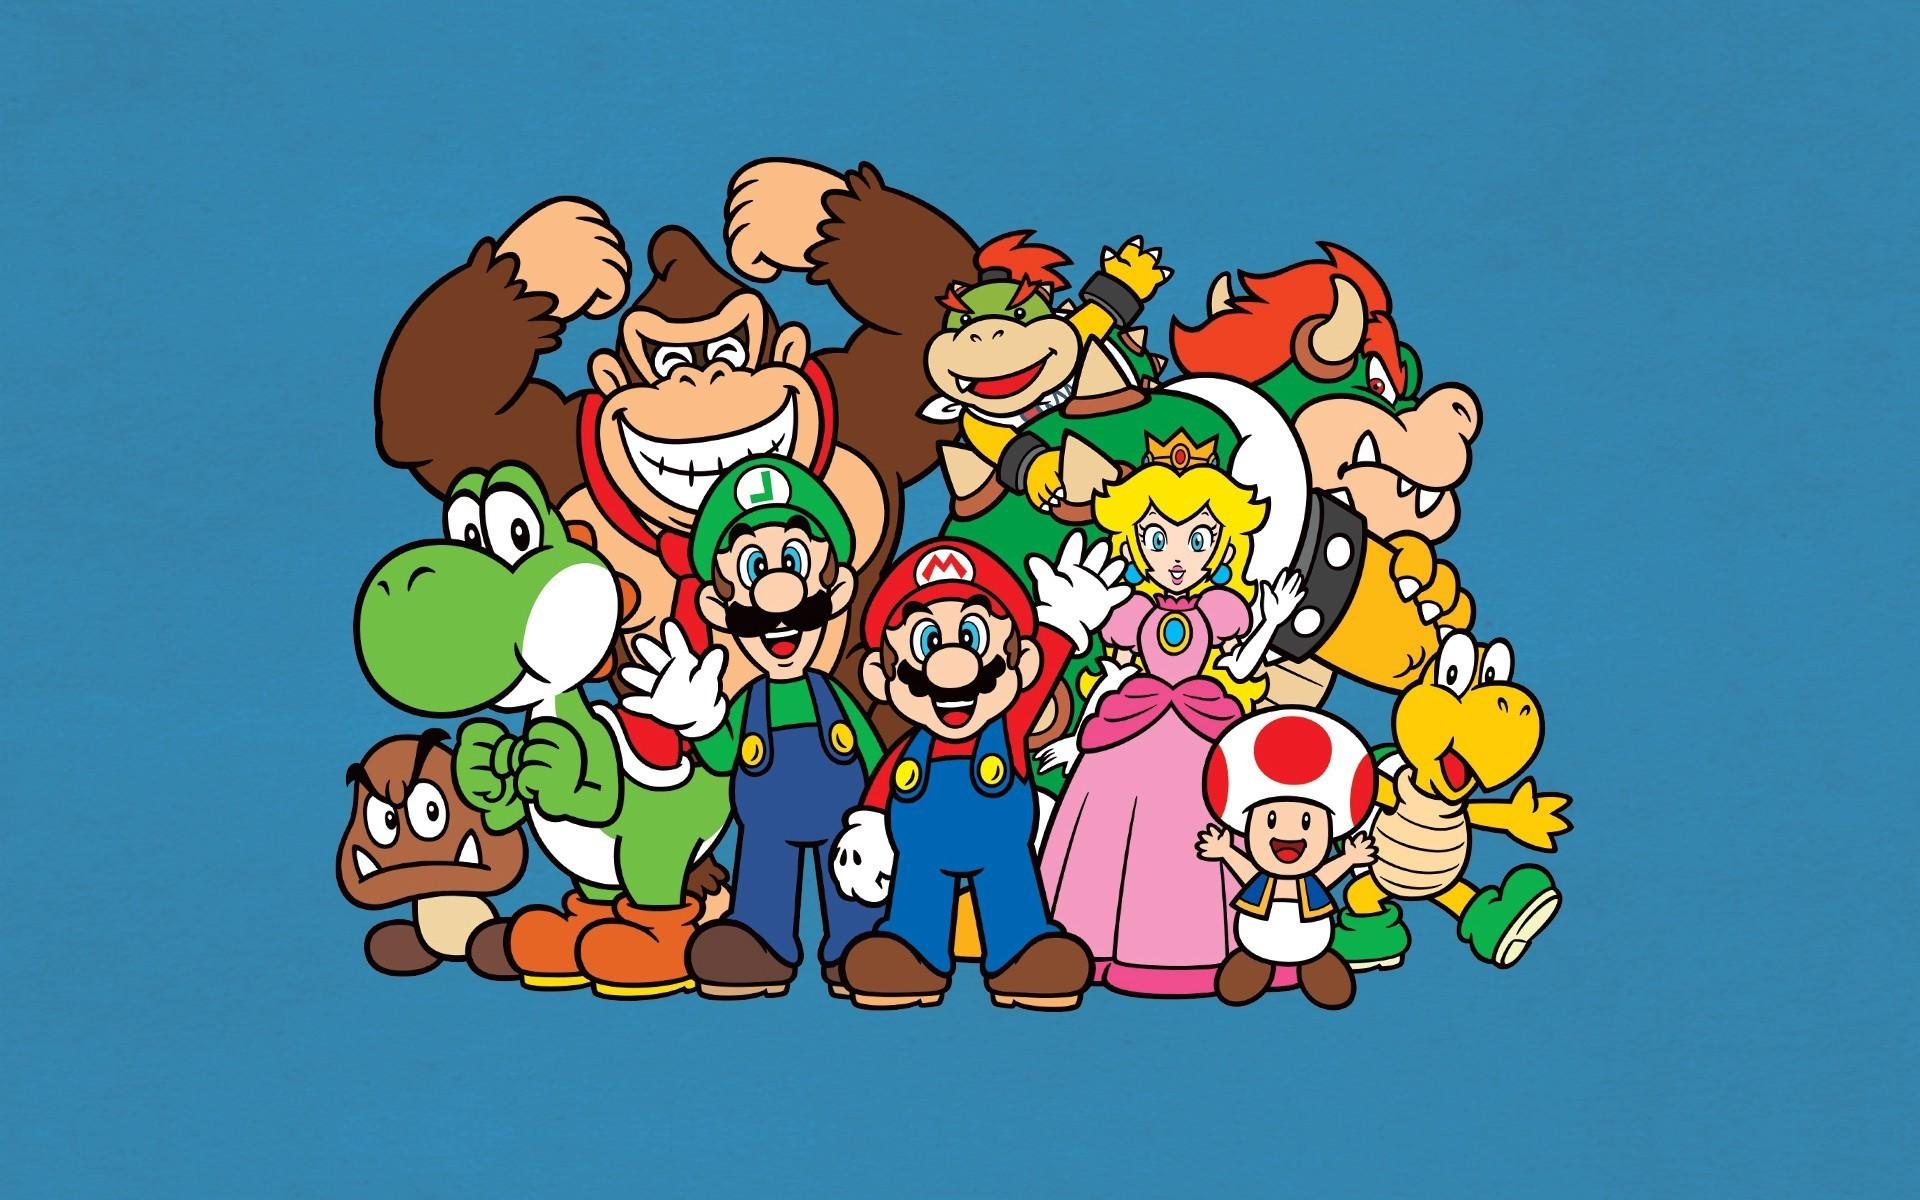 Mario Desktop Backgrounds: Mario And Luigi Backgrounds (54+ Images